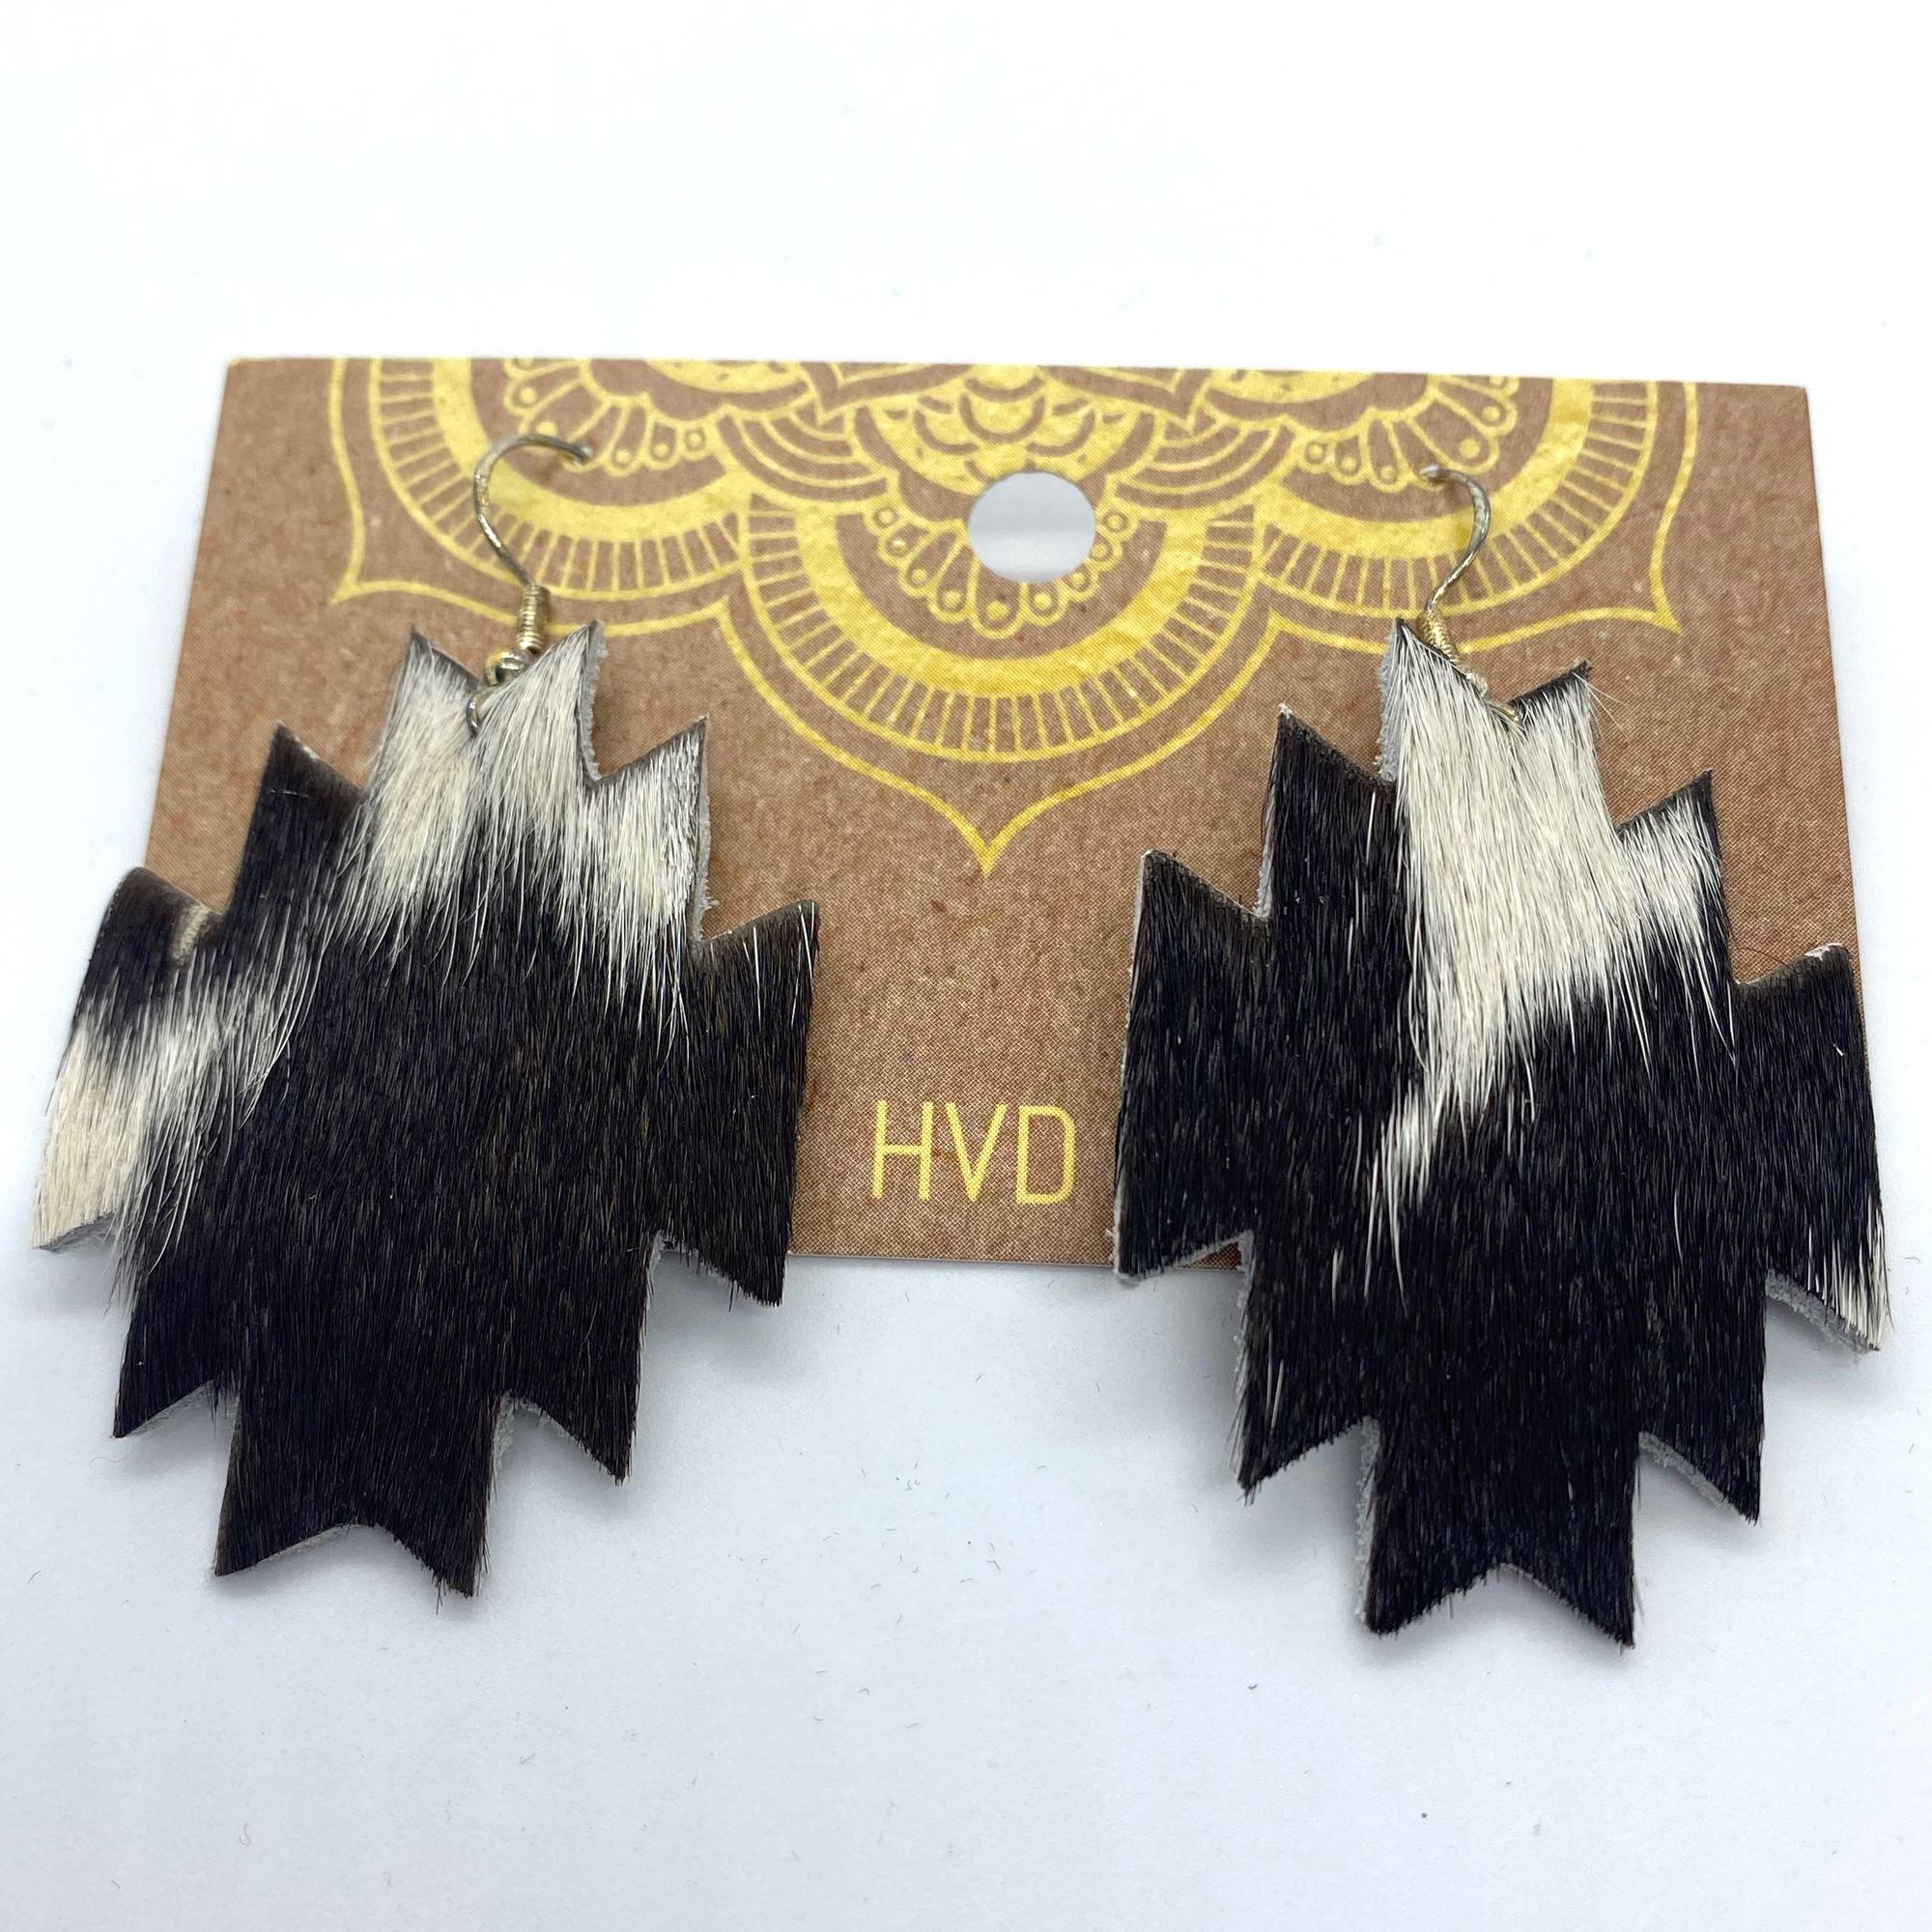 Black & White Hair-On-Hide Aztec Earrings (2)